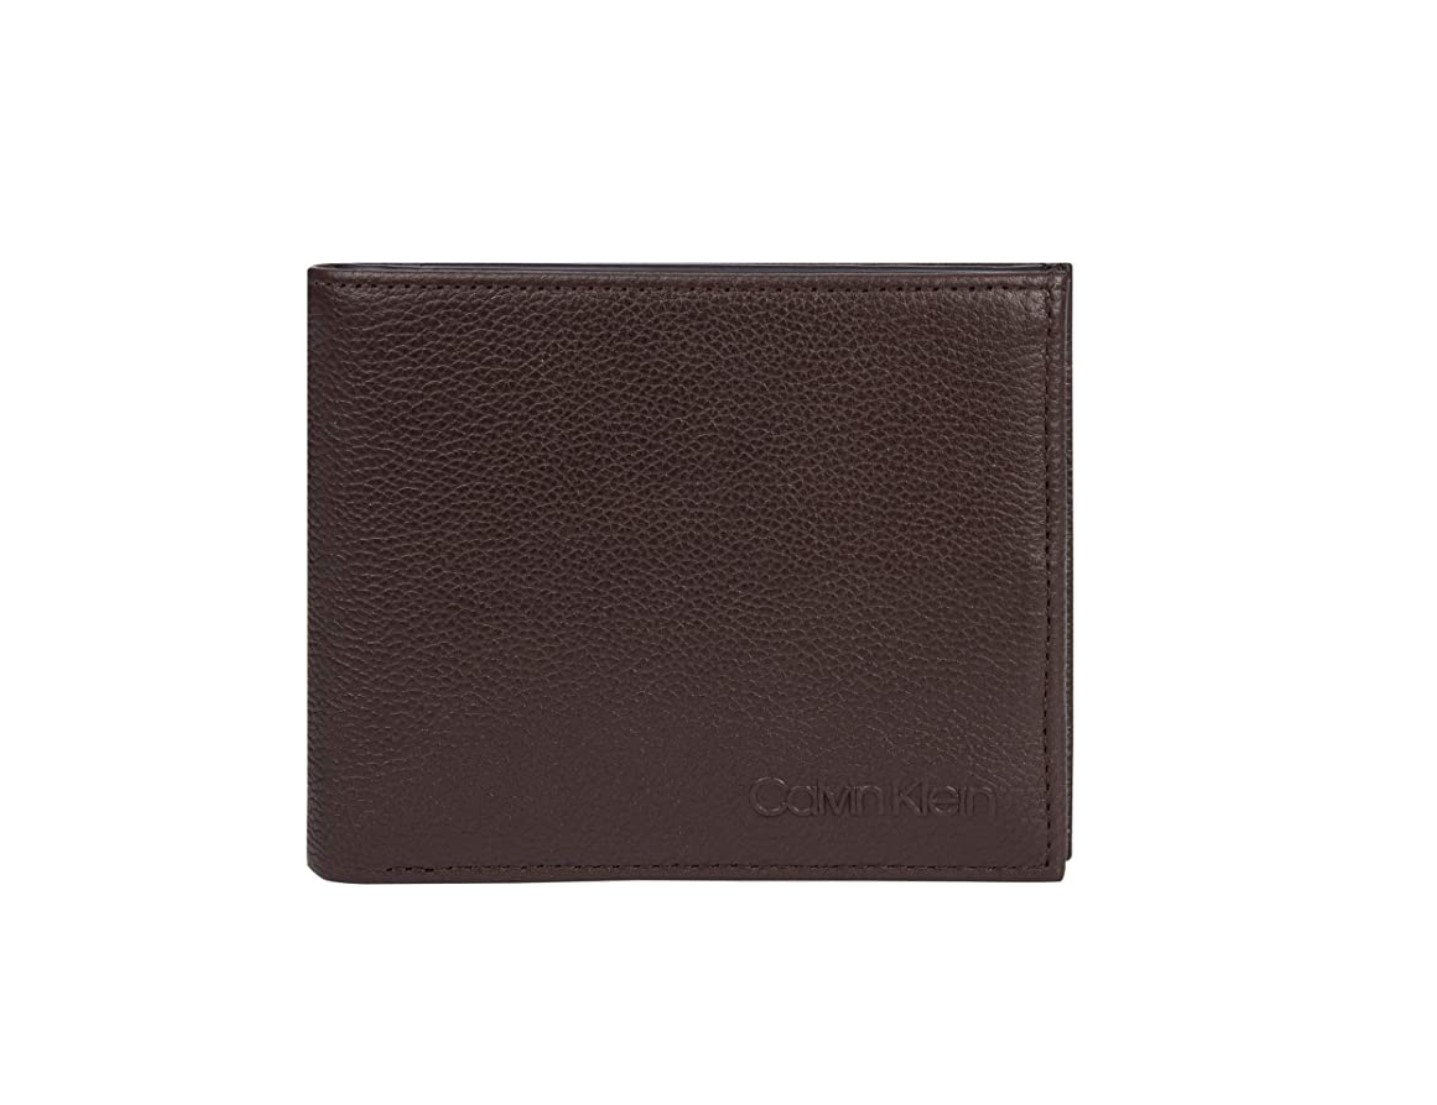 Calvin Klein Calvin Klein pánská hnědá peněženka BIFOLD 5CC W/ COIN